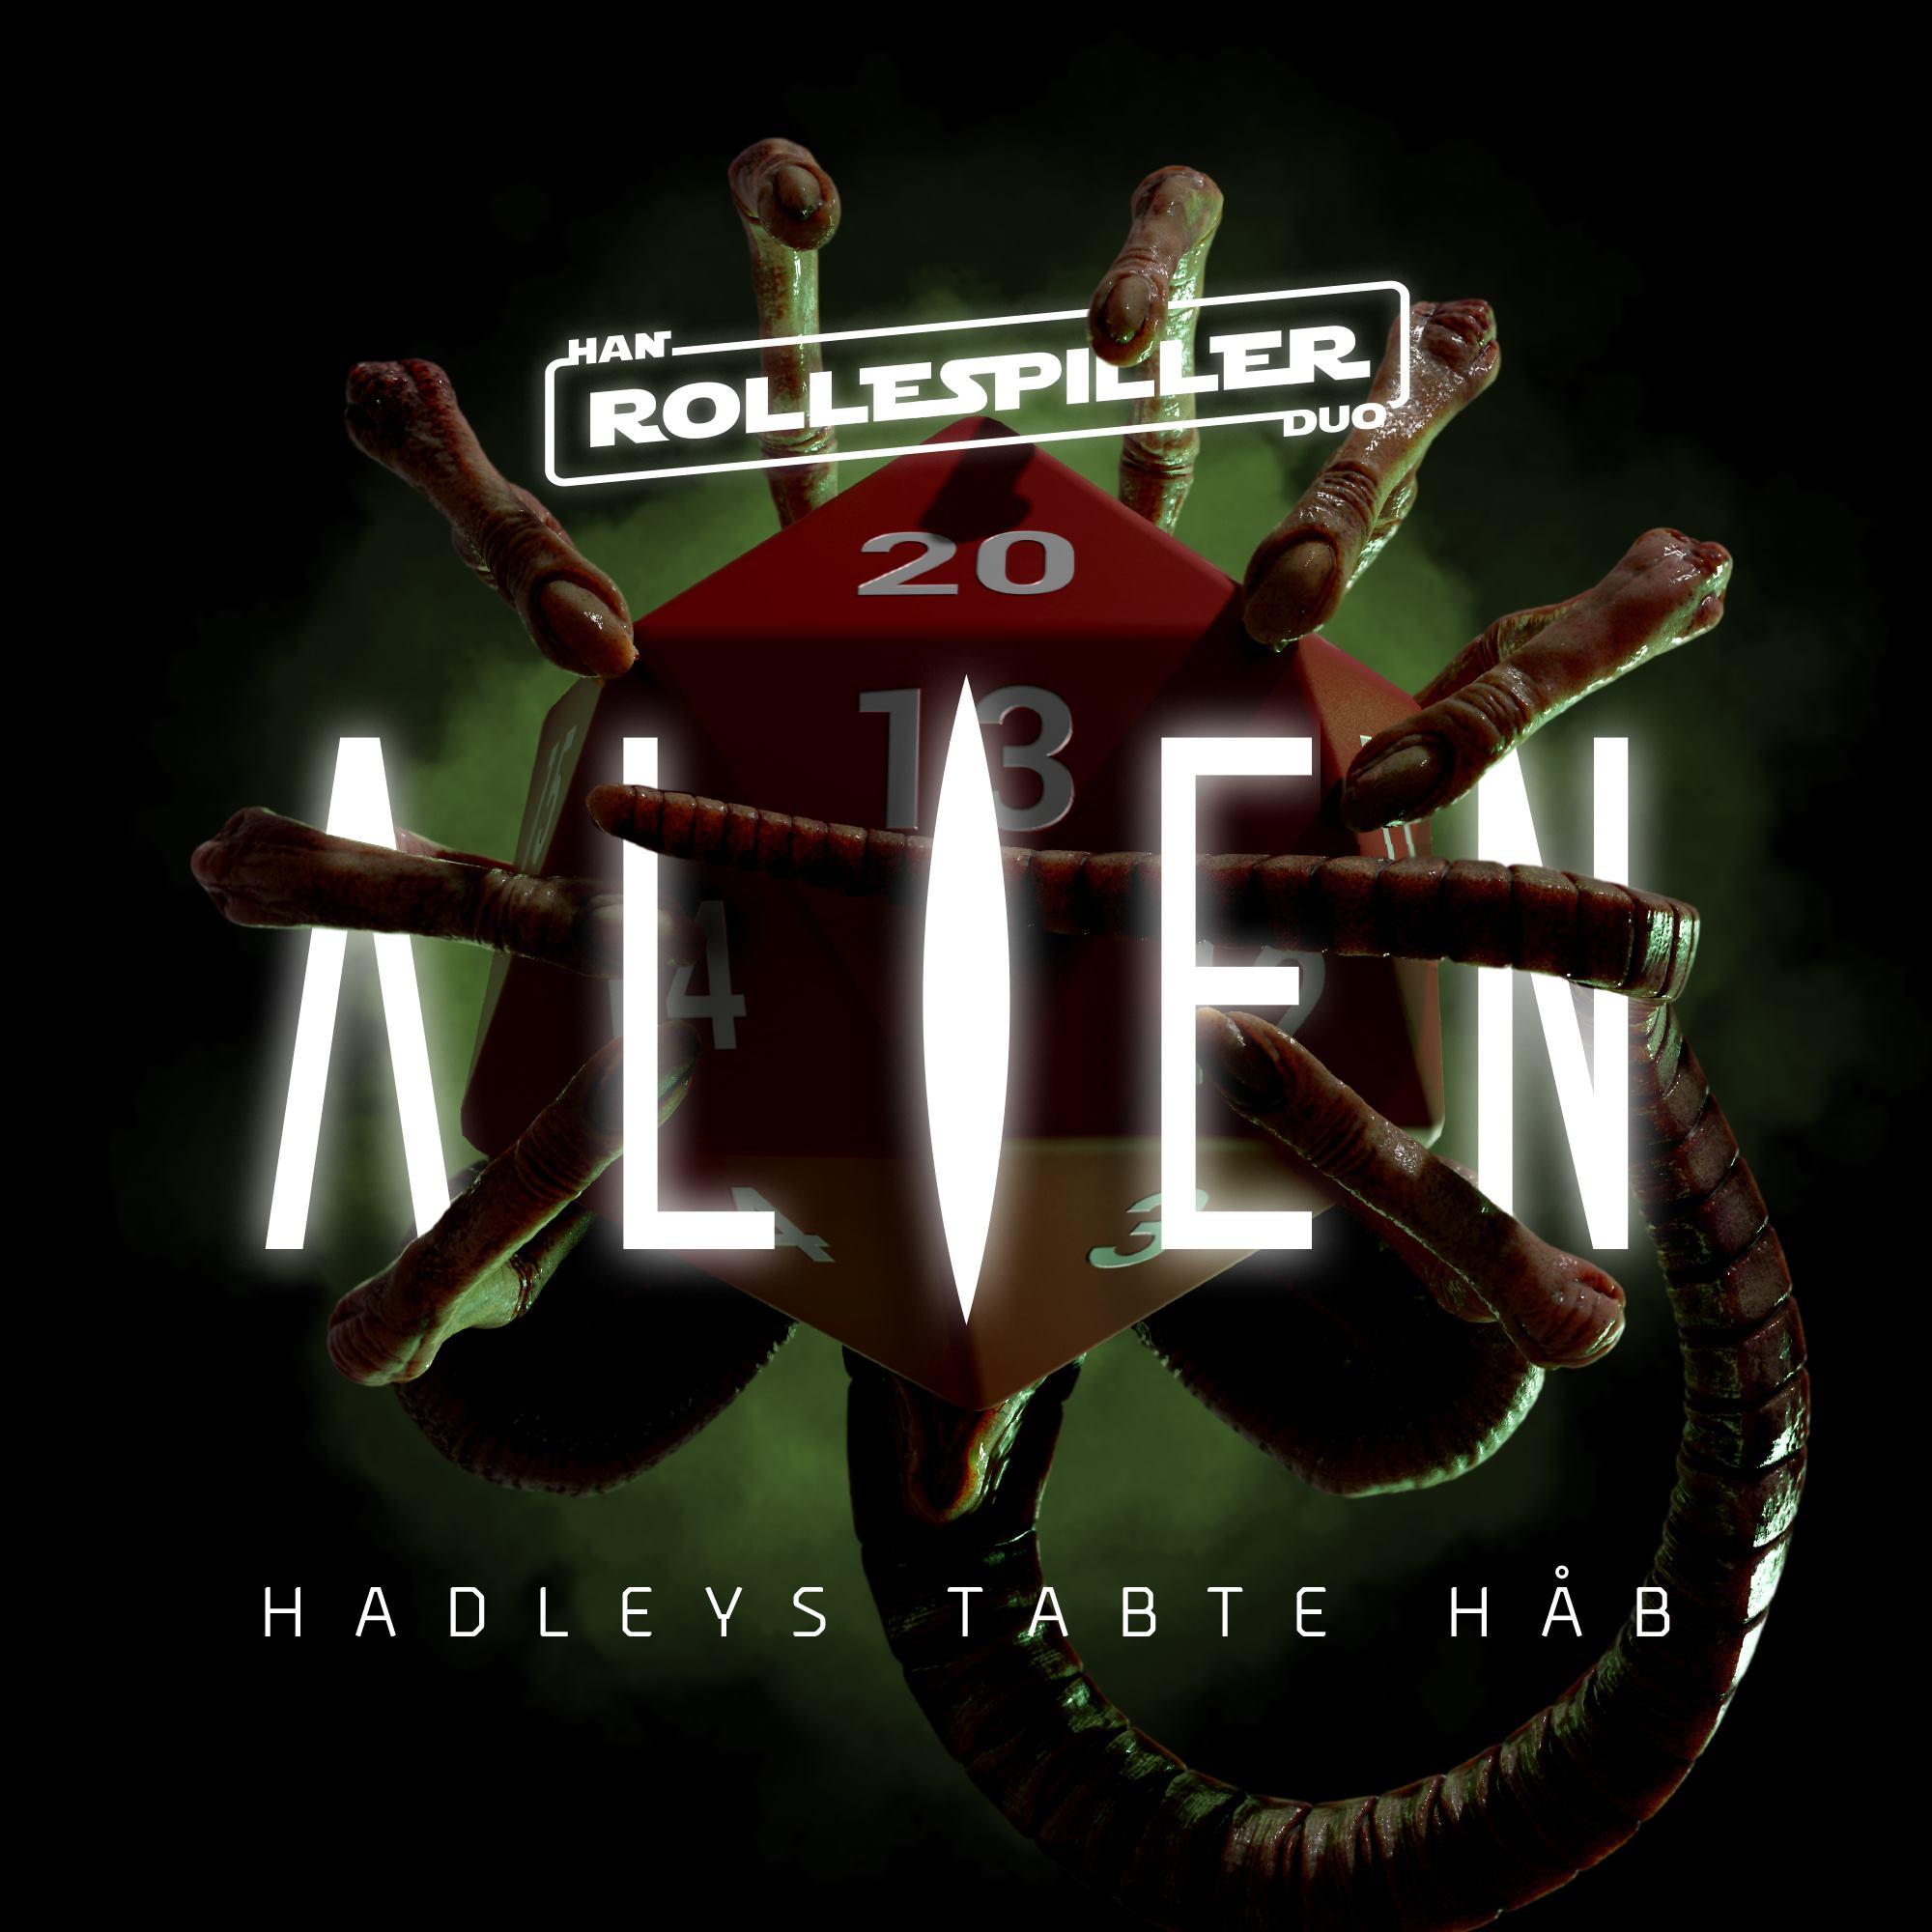 Han Duo Rollespiller: Alien 3:4